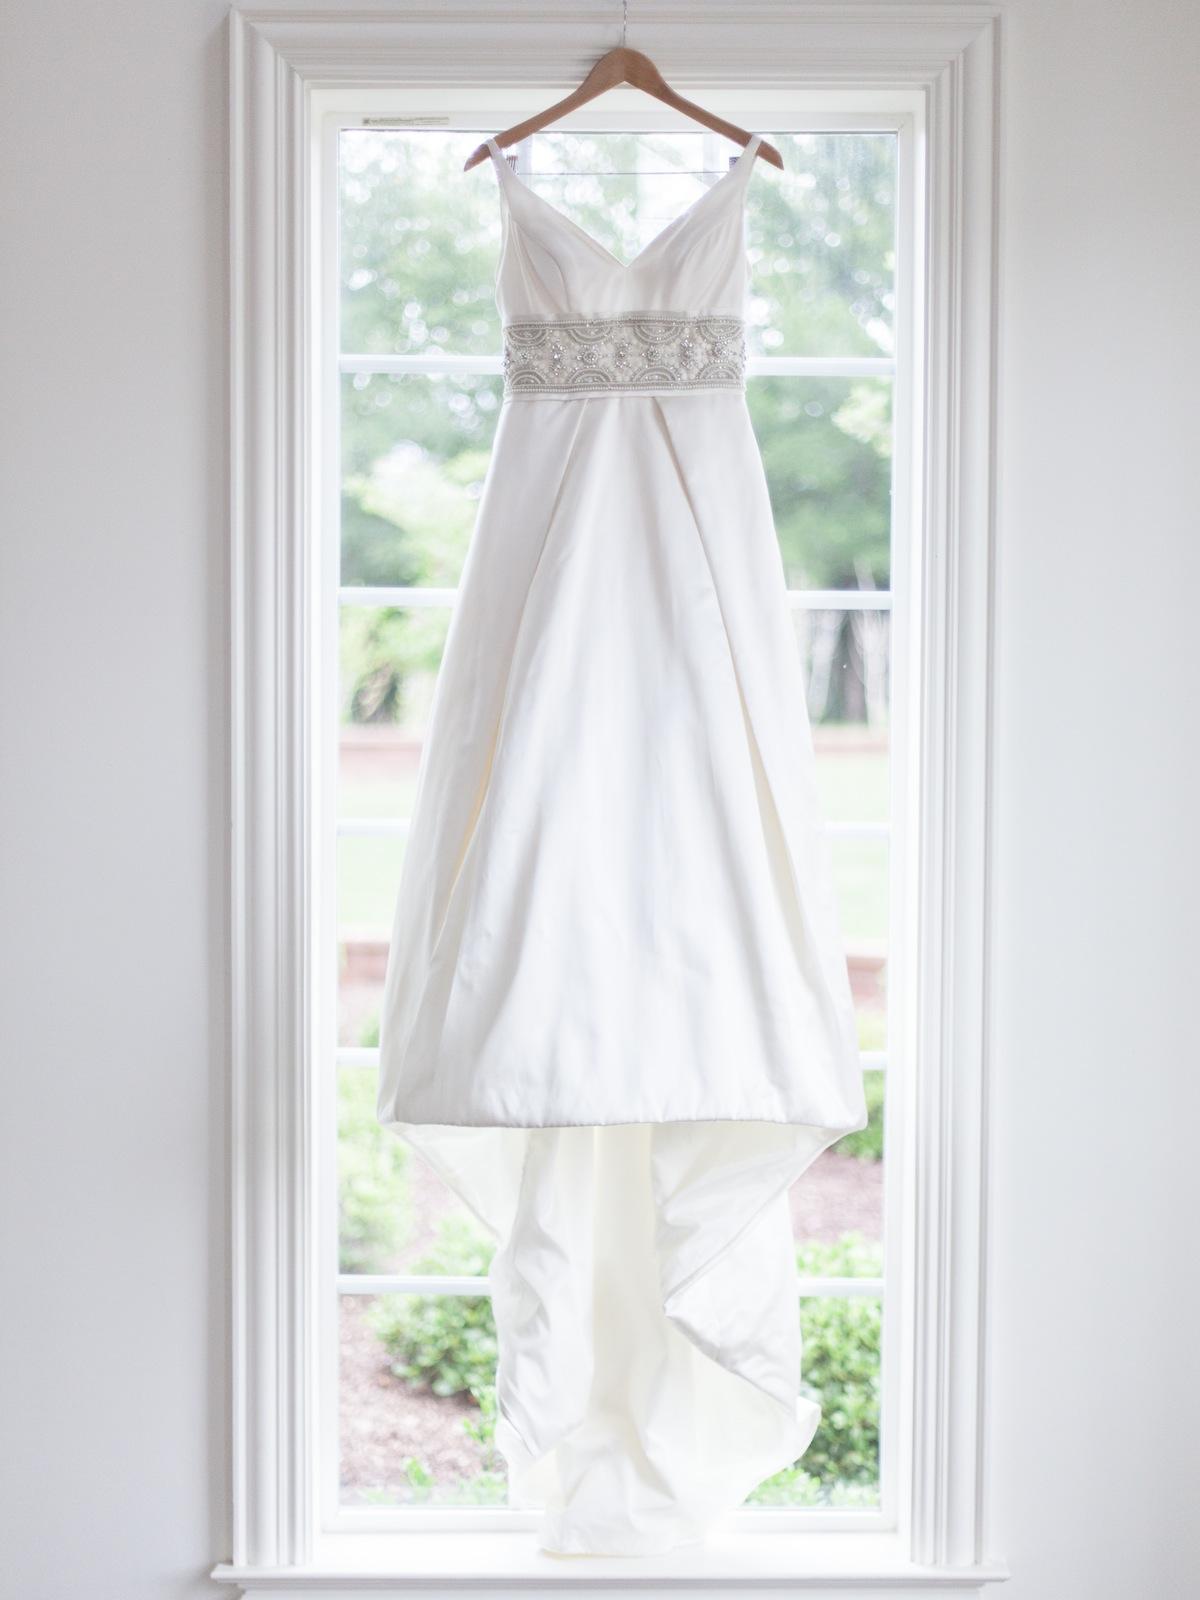 The-Milestone-Denton-Texas-Wedding-Photography-Votive-3.jpg